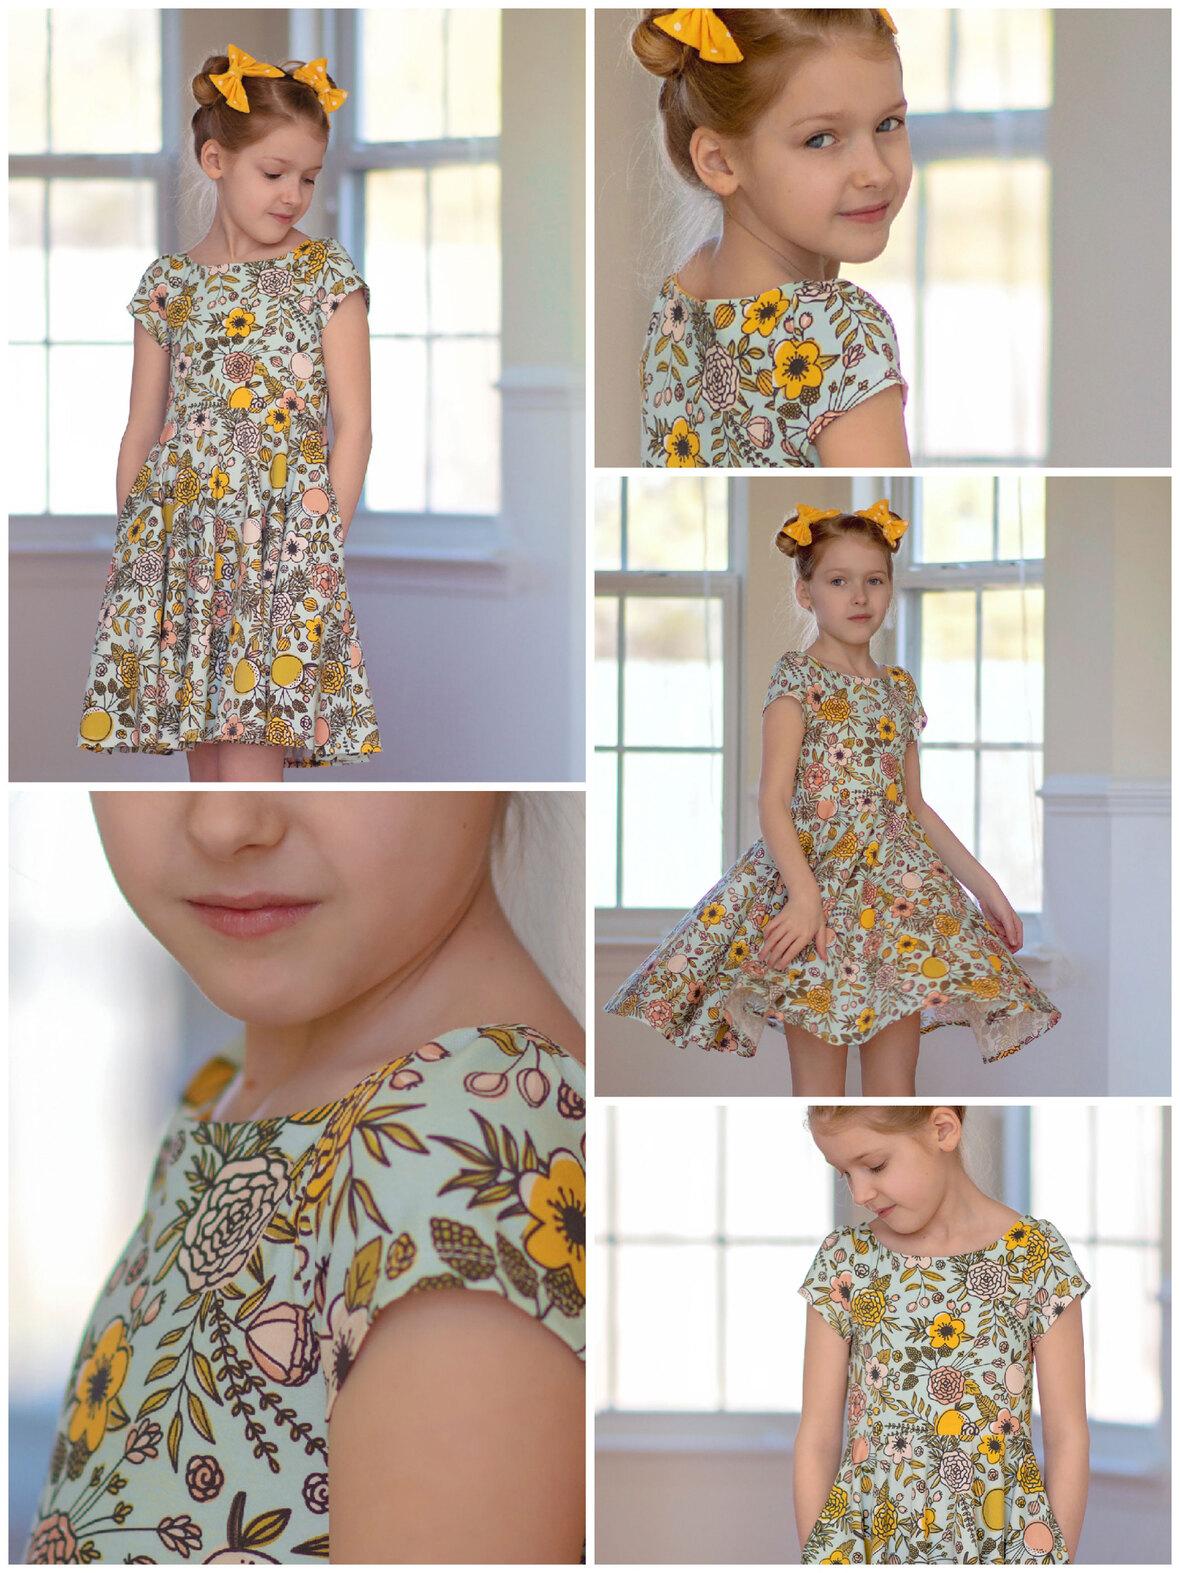 Peachy-Meadows-Knit-Dress